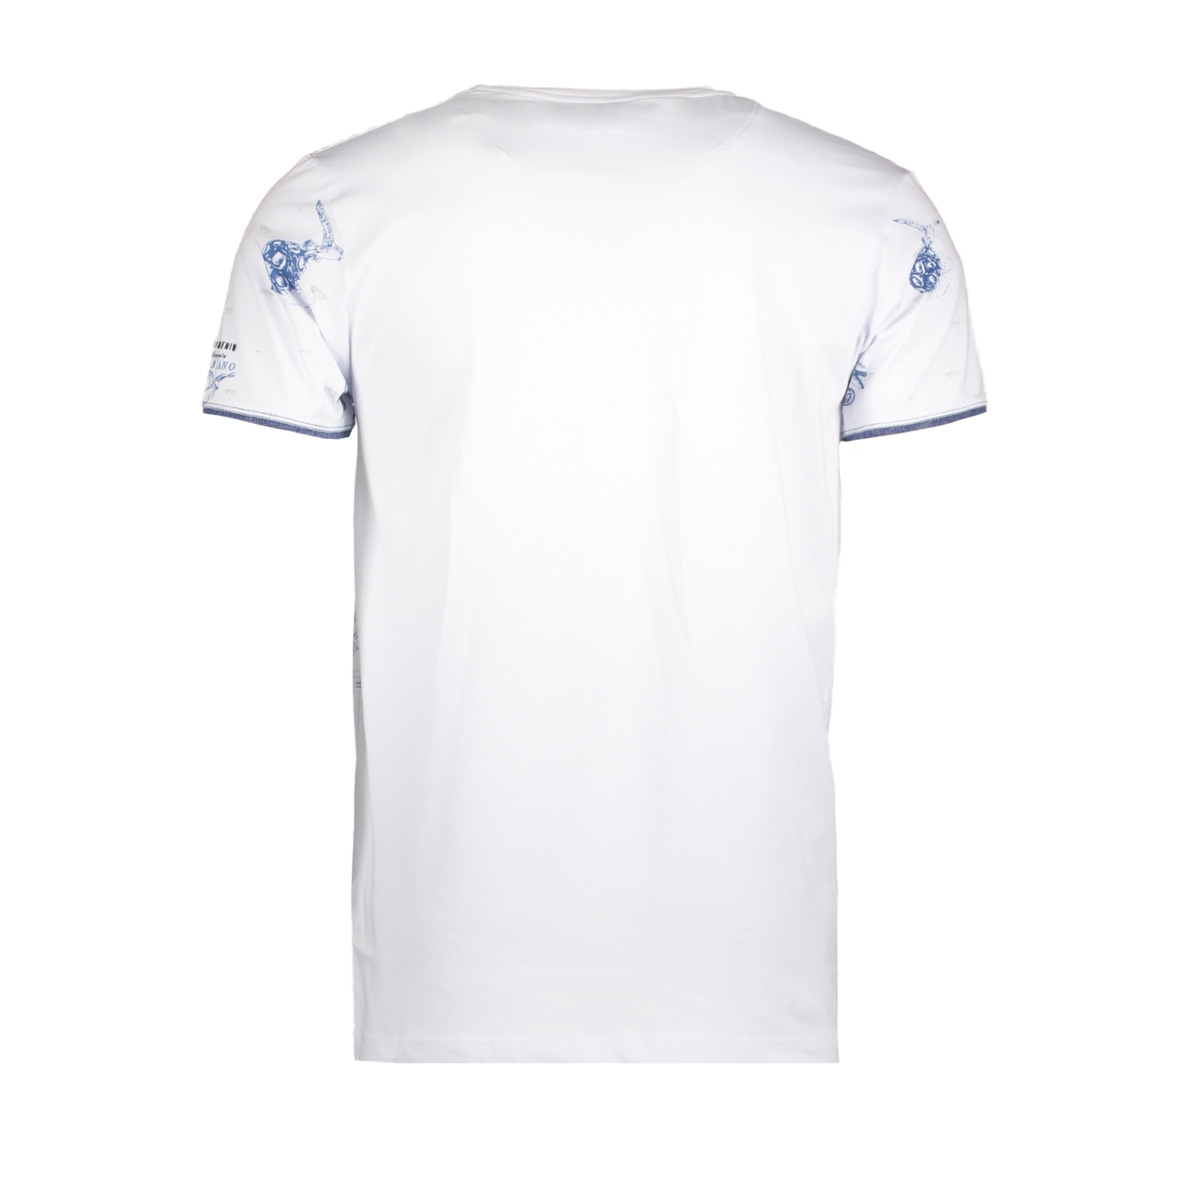 13886 gabbiano t-shirt white